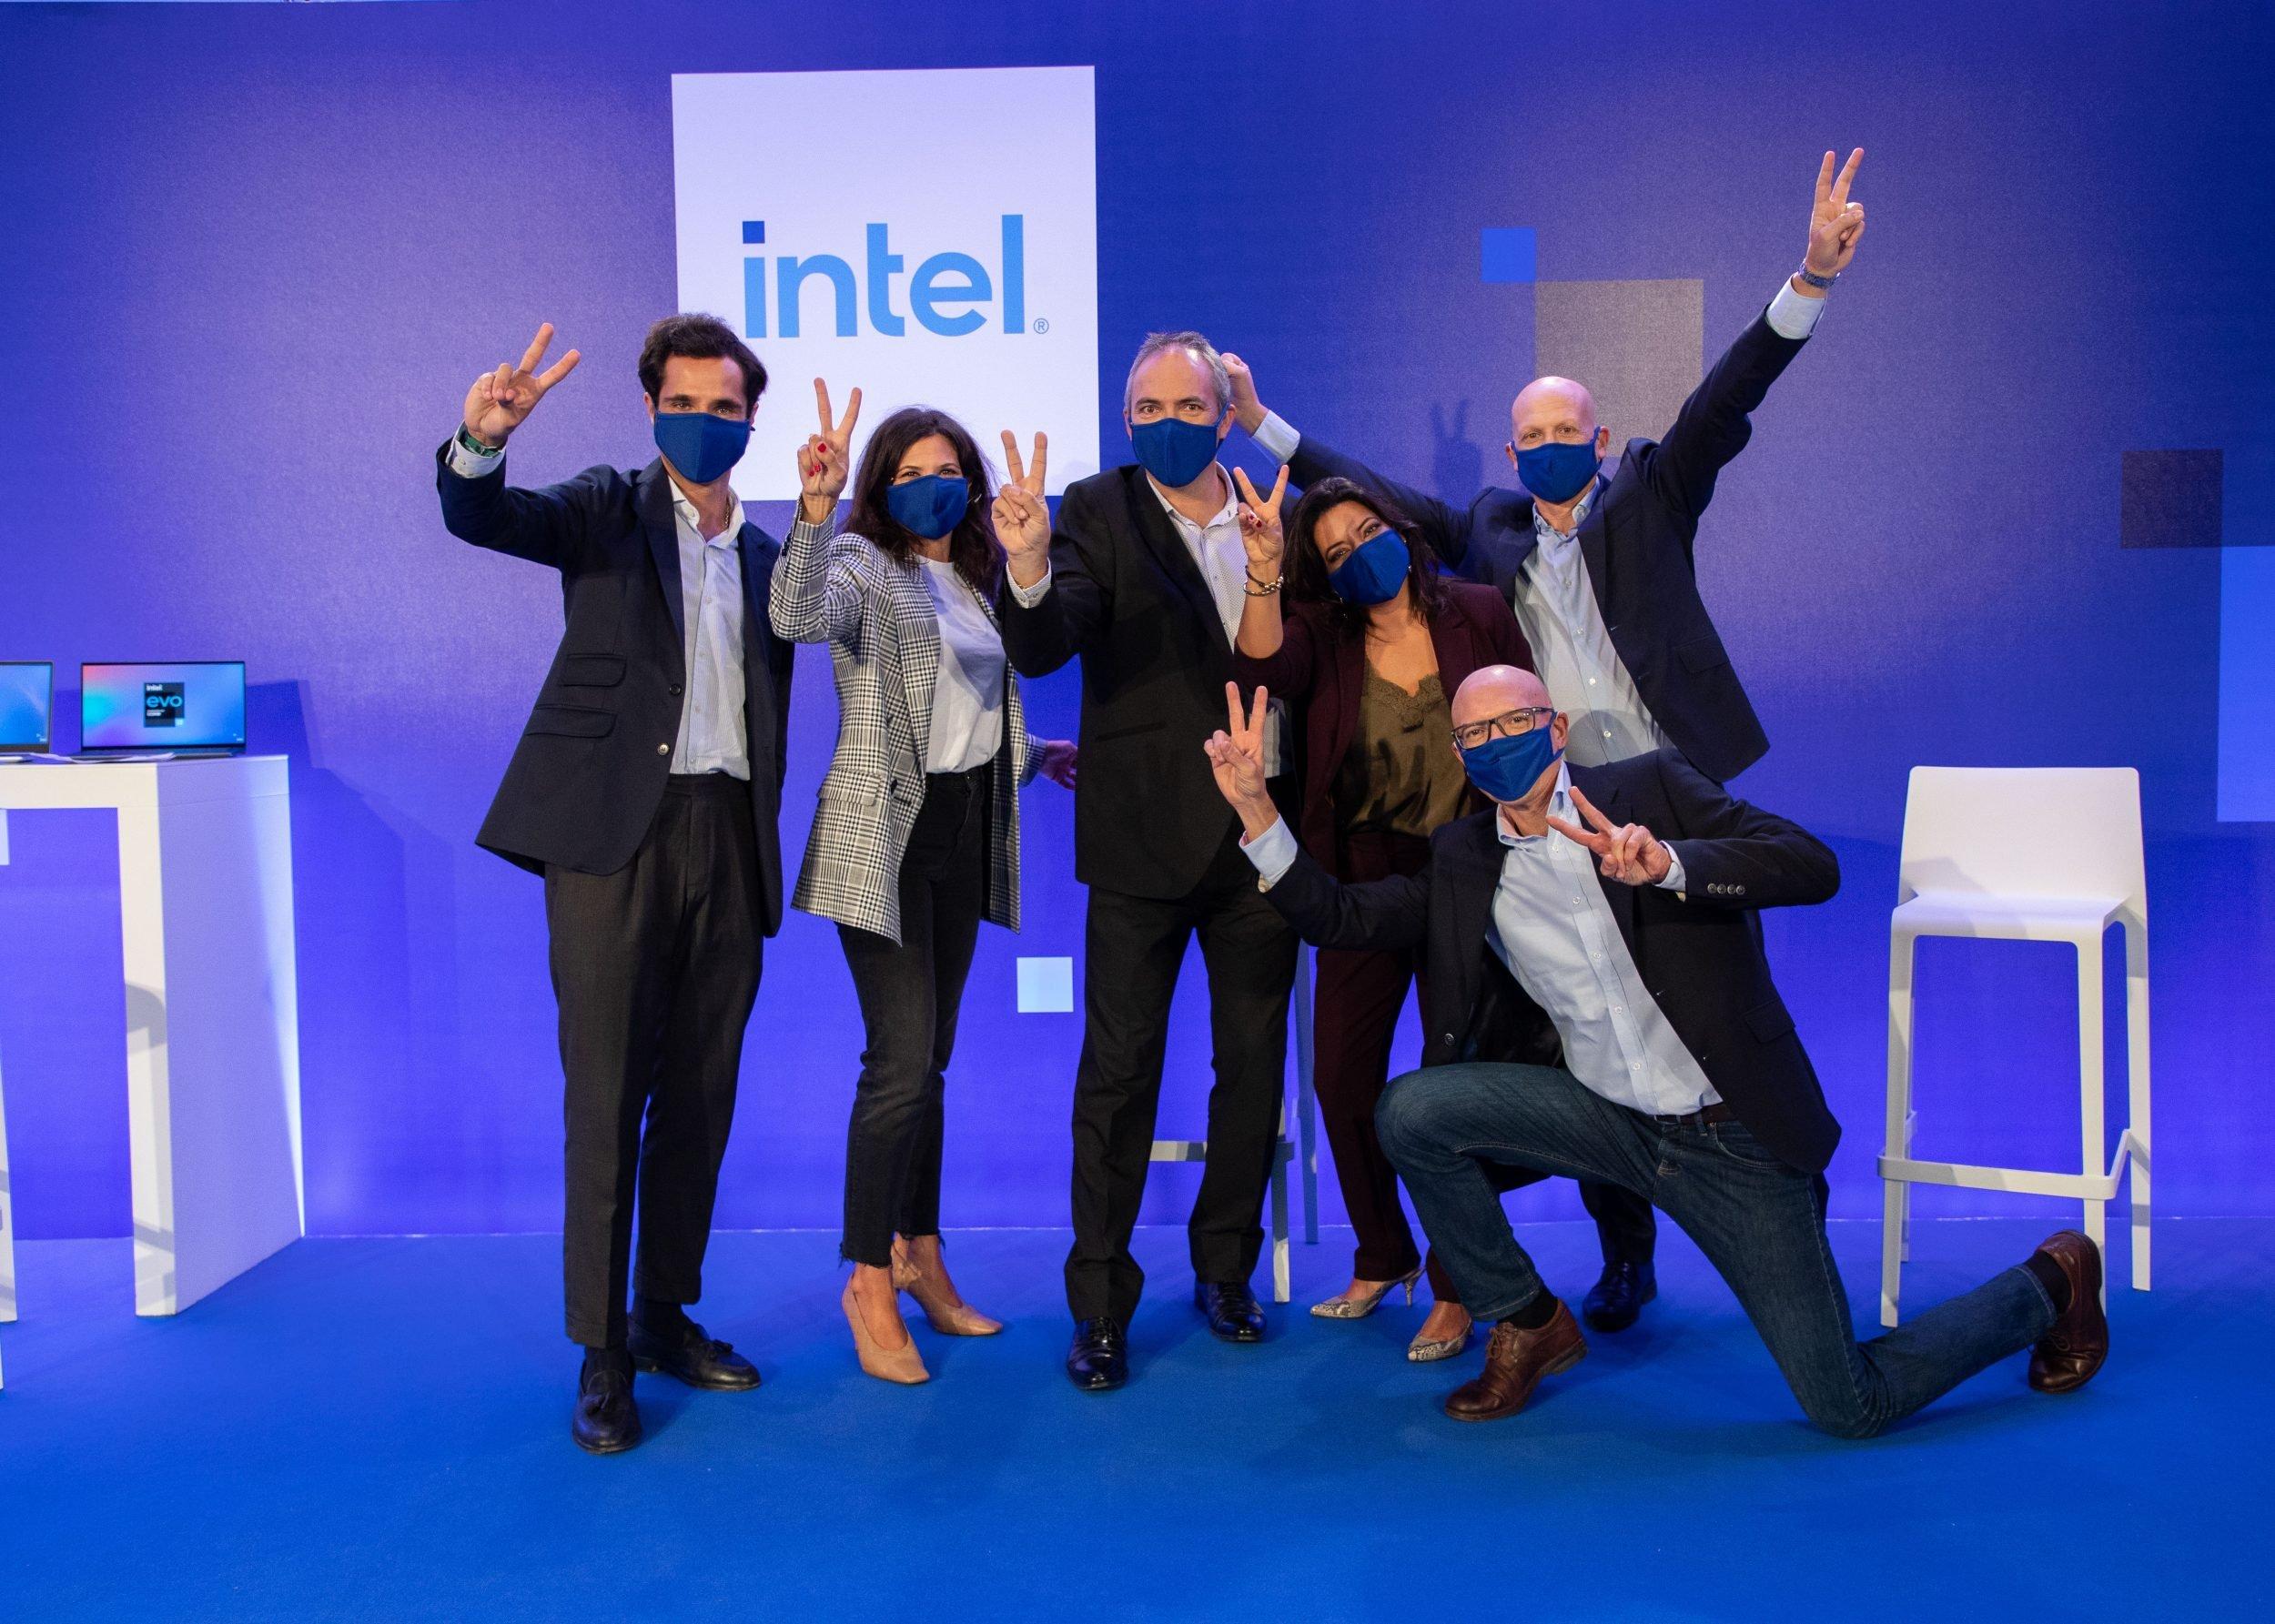 intel-insiders-nanook-agency-digital-events